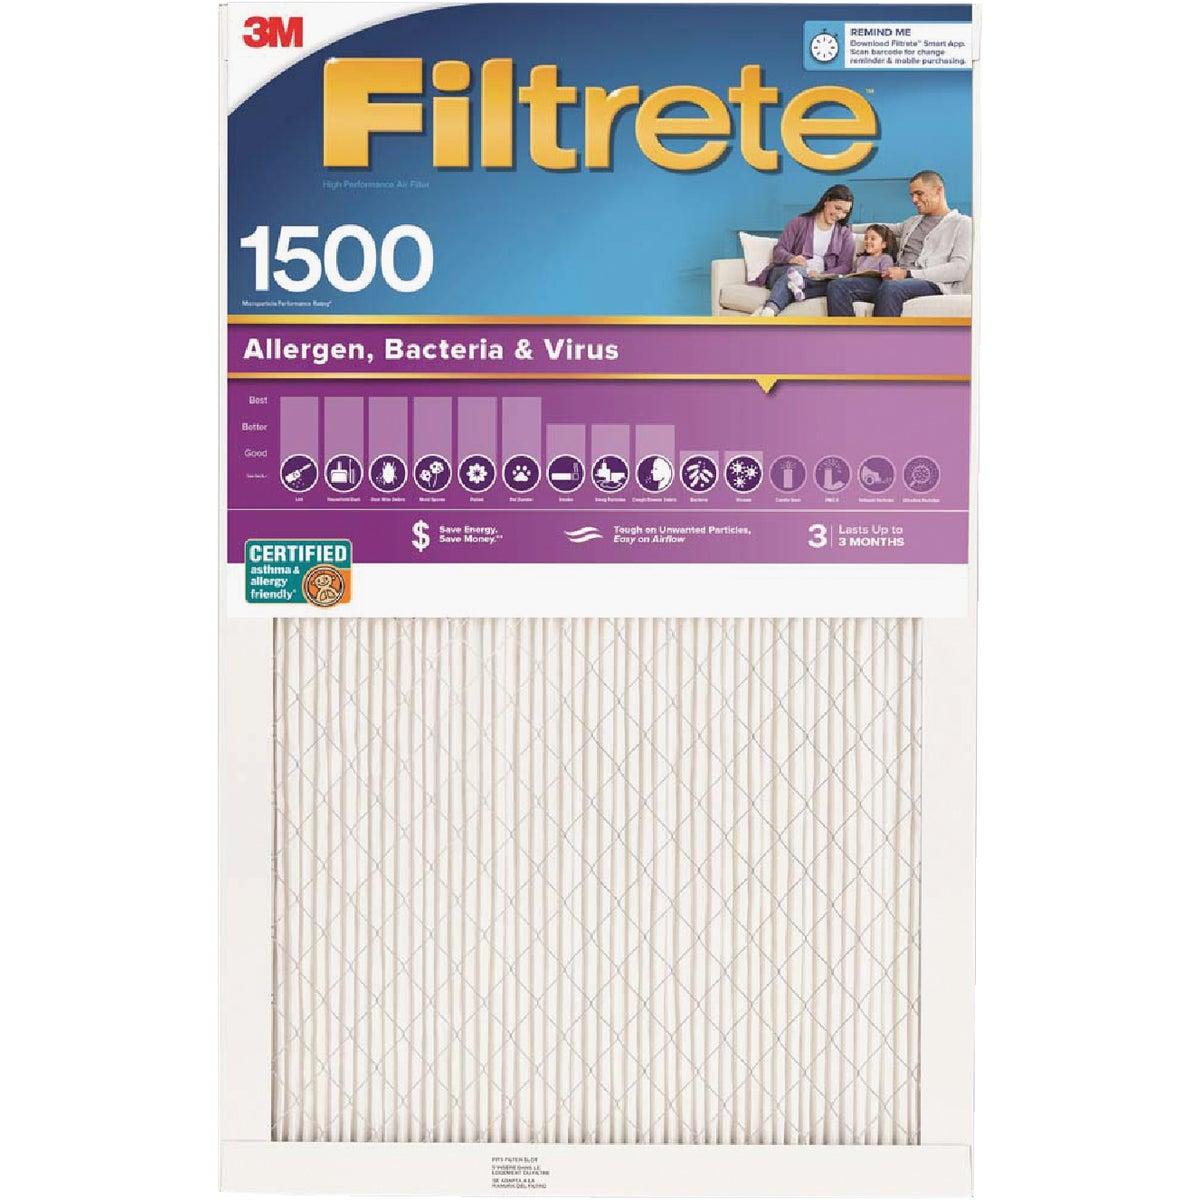 3M Filtrete 16 In. x 20 In. x 1 In. Ultra Allergen Healthy Living 1550 MPR Furnace Filter